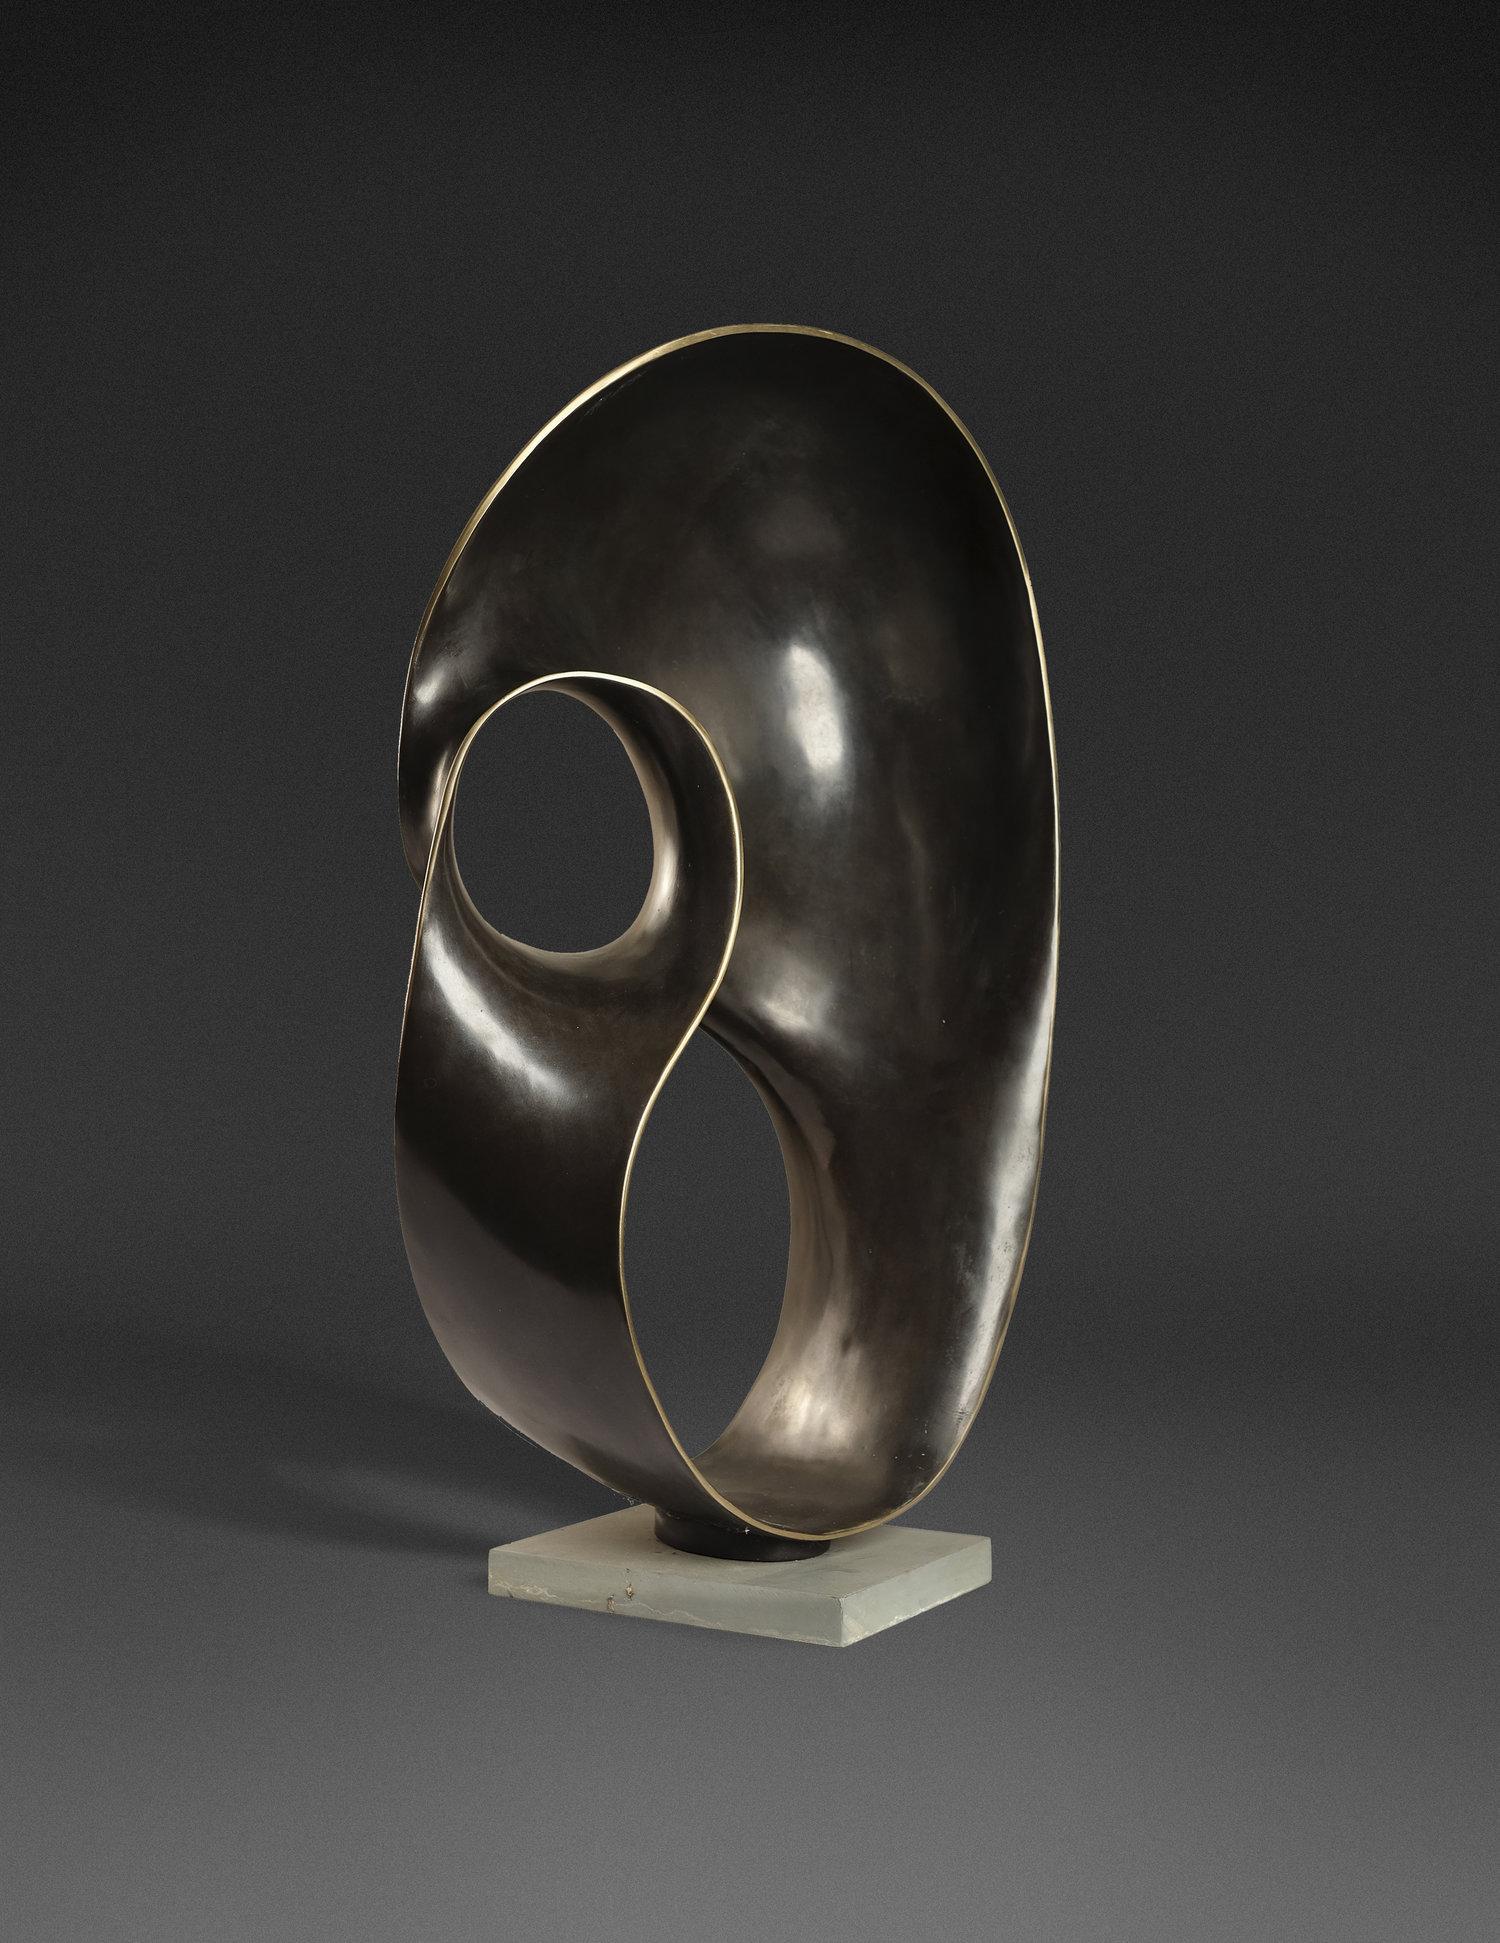 Ahmad Osni Peii, Sarinah, bronze, 41 x 71 x 21 cm, 1991